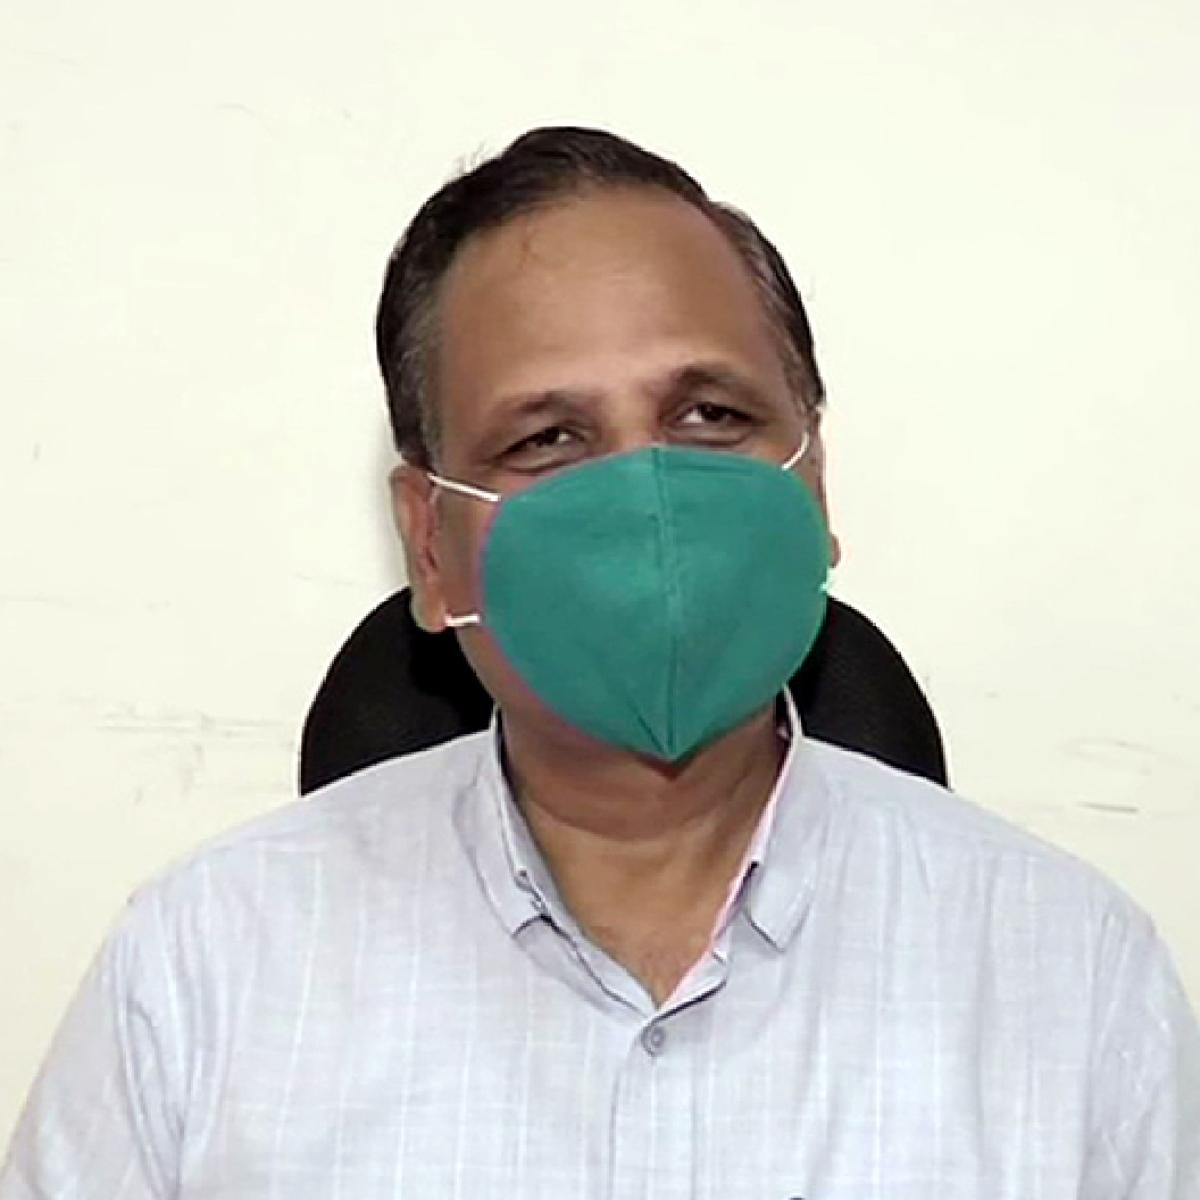 Latest sero survey shows 56.13% people in Delhi have antibodies against COVID-19: Satyendar Jain